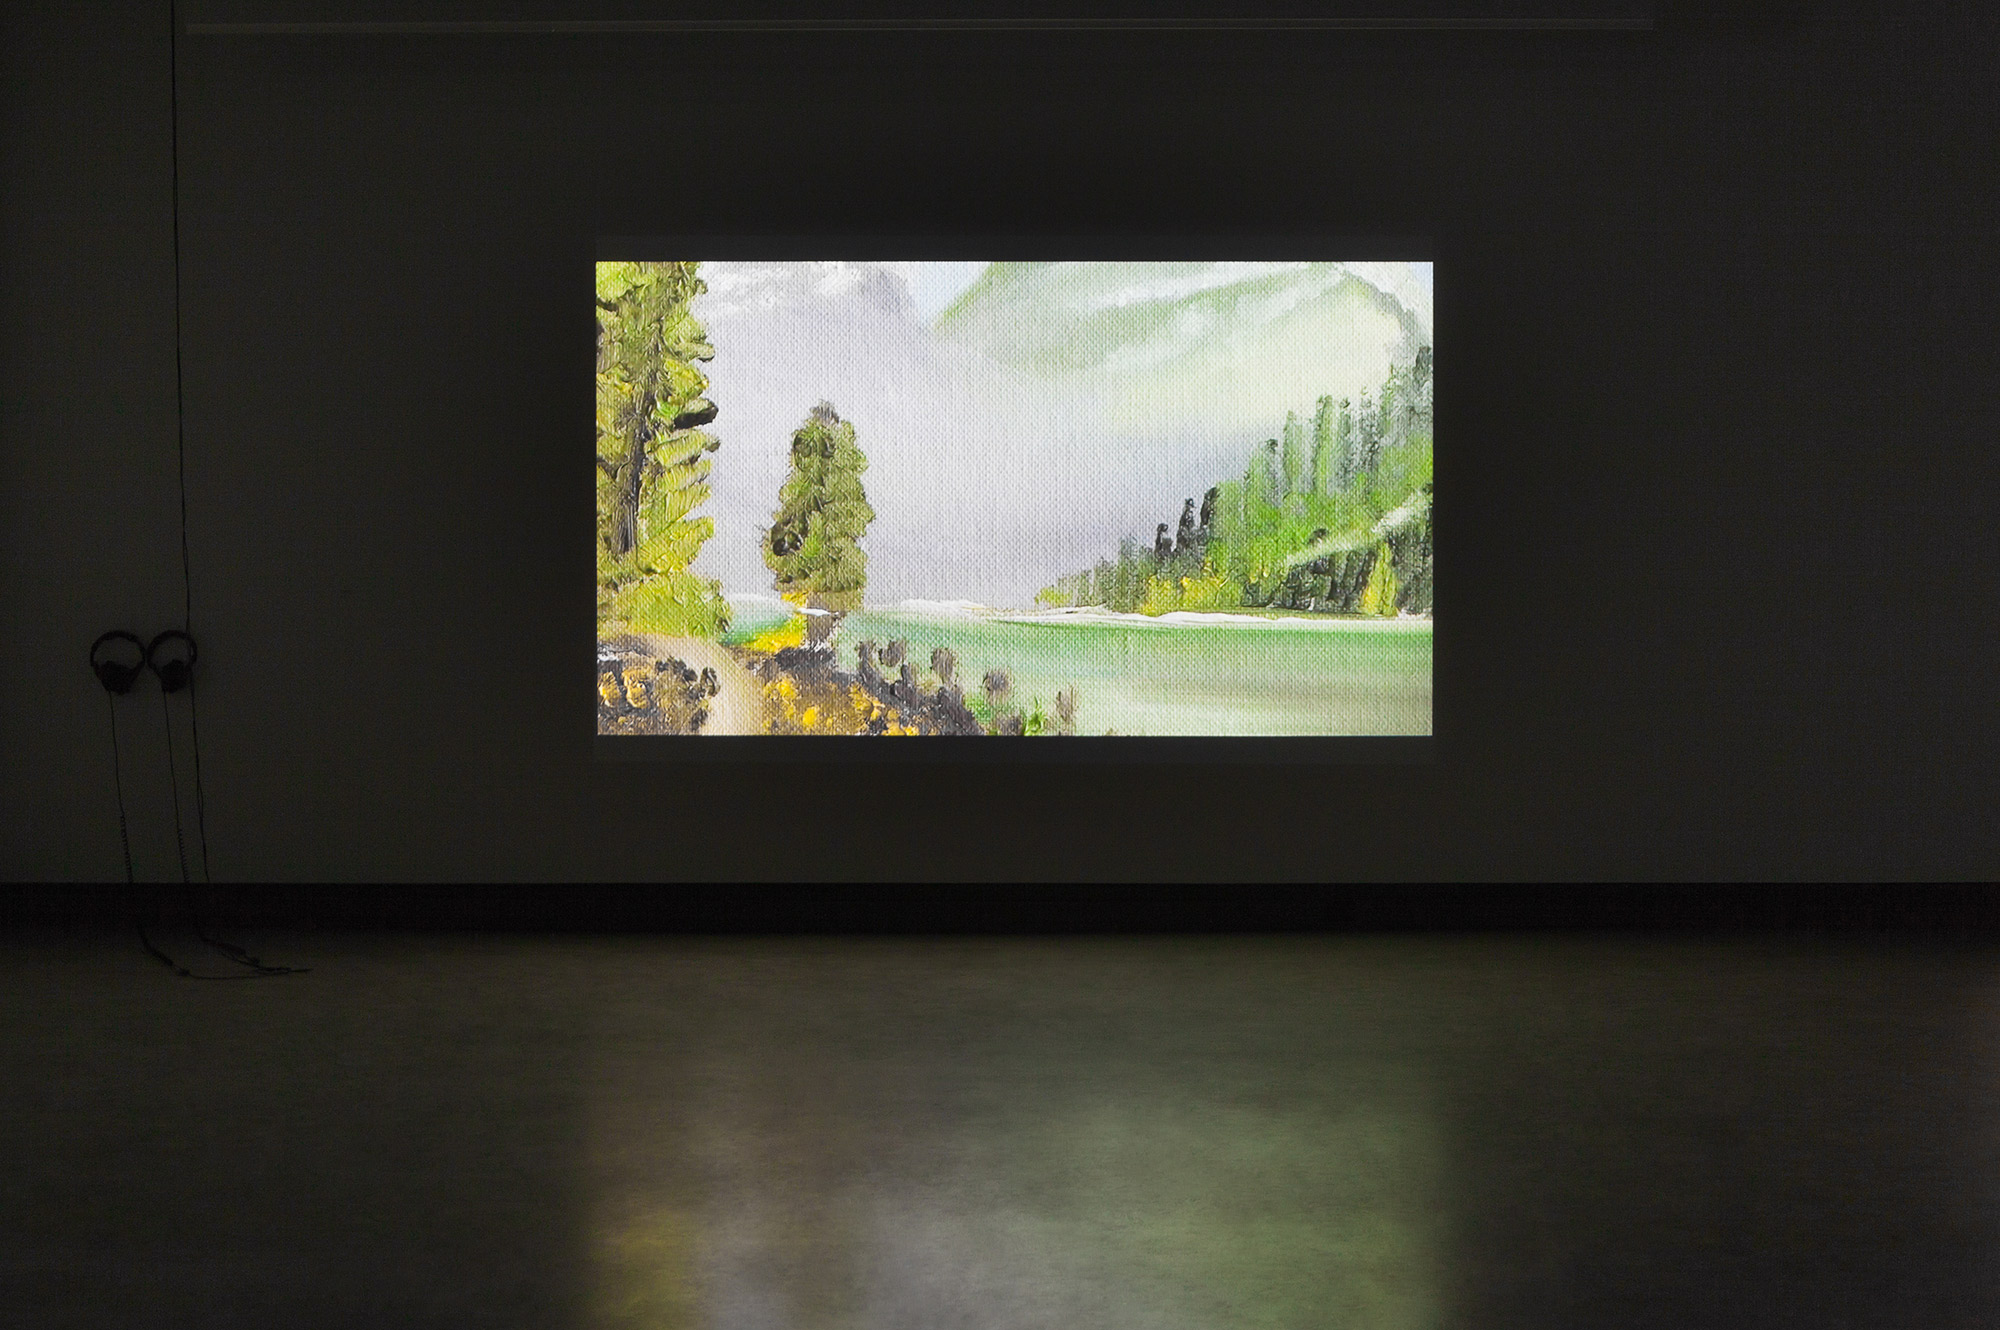 © Jo-Anne Balcaen, Mount Rundle  (2014). Exhibition view. Photo: Marilou Crispin.